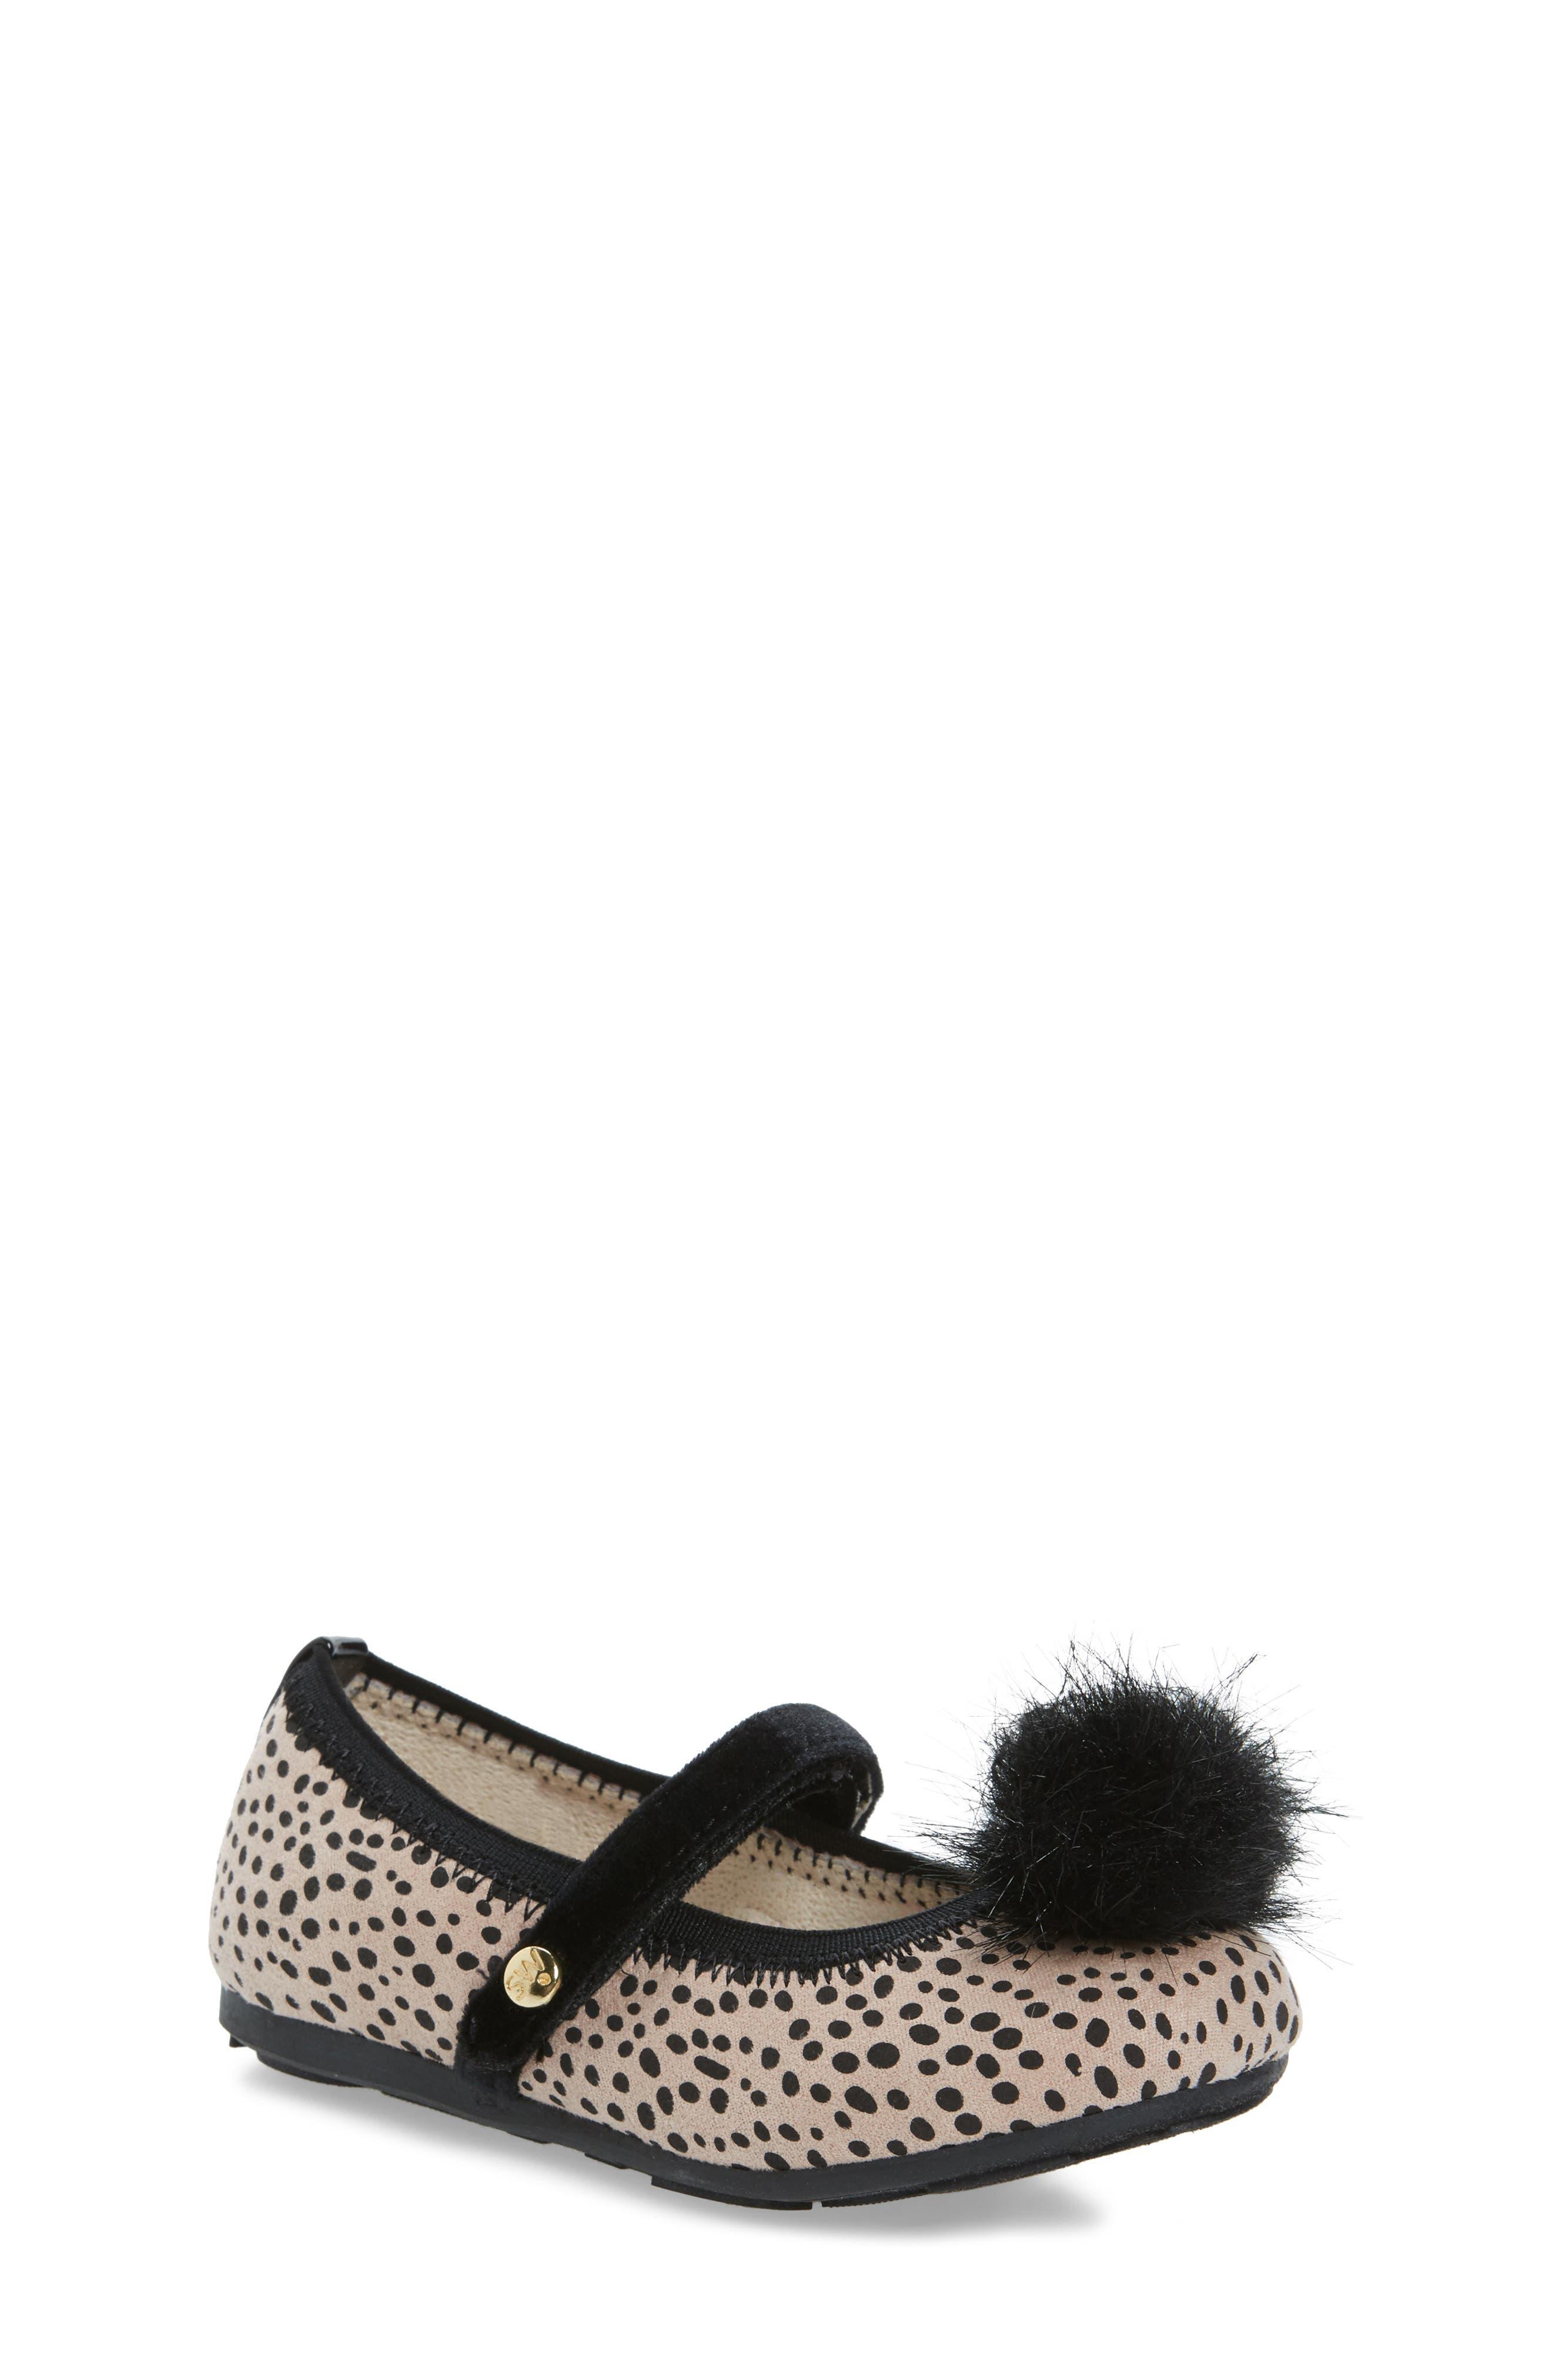 Alternate Image 1 Selected - Stuart Weitzman Fannie Cheetah Faux Fur Mary Jane (Walker & Toddler)